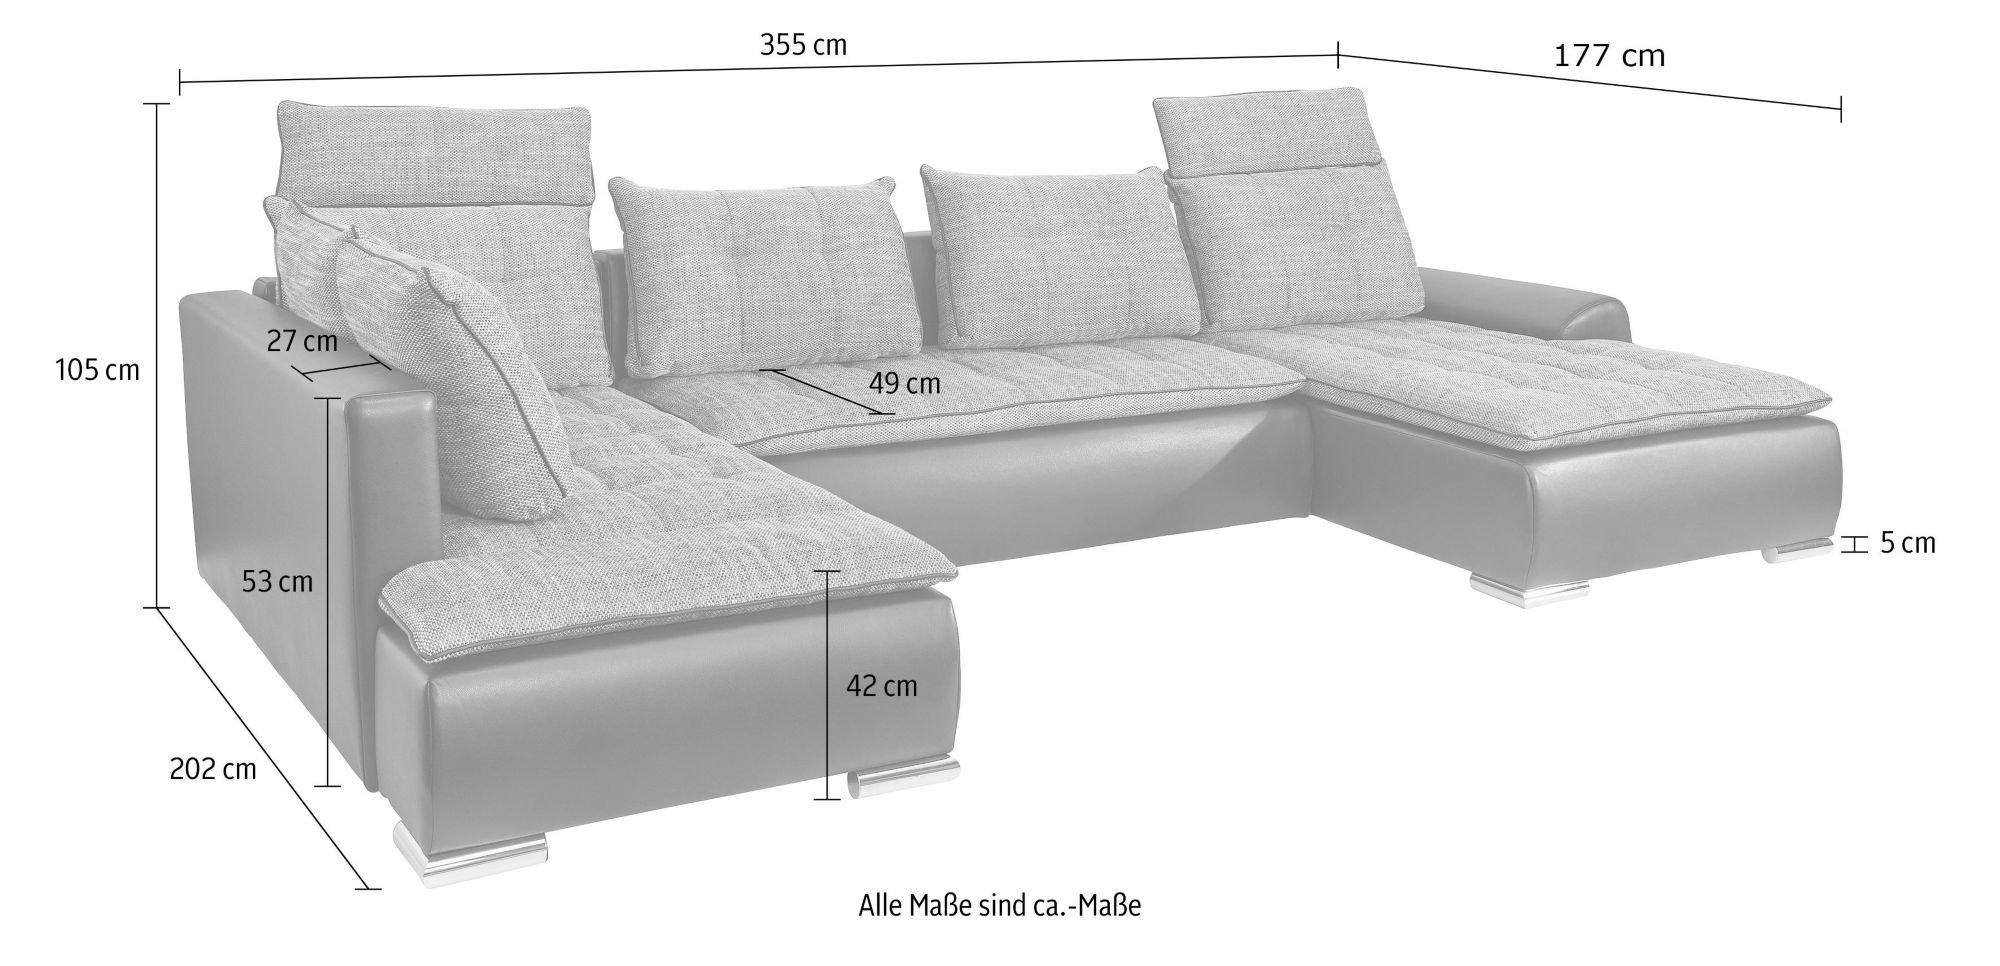 wohnlandschaft mit bettfunktion schwab versand wohnlandschaften. Black Bedroom Furniture Sets. Home Design Ideas